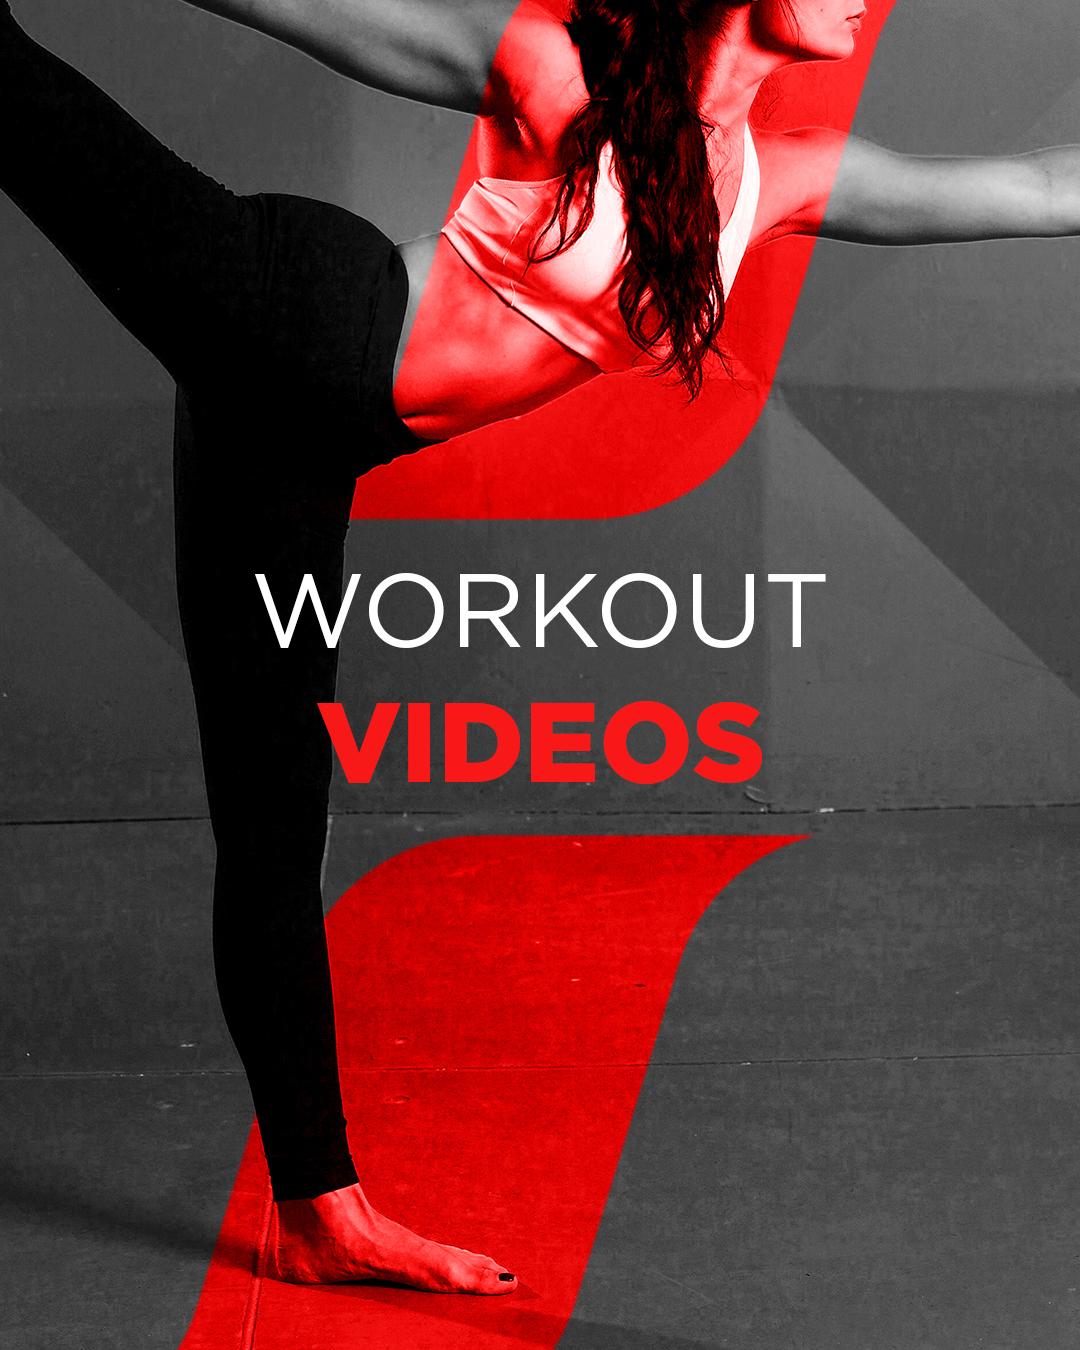 Workout Videos, Videography, Studio Shoot, Location Shoot, Professional Video Shoots